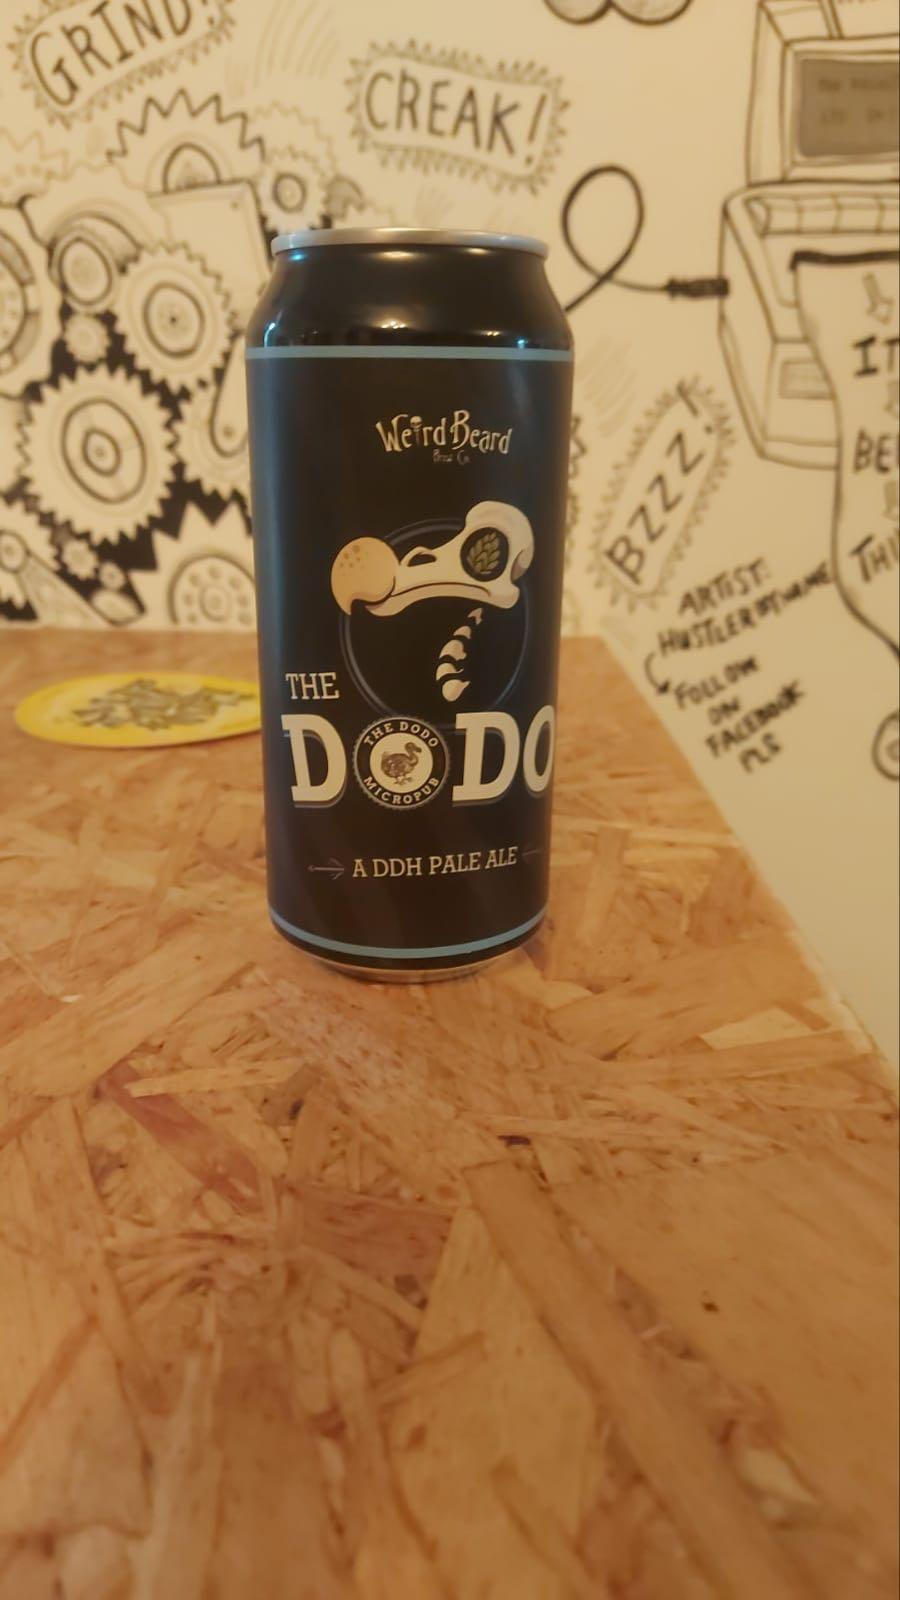 Weird Beard Brew Co The Dodo DDH Pale Ale